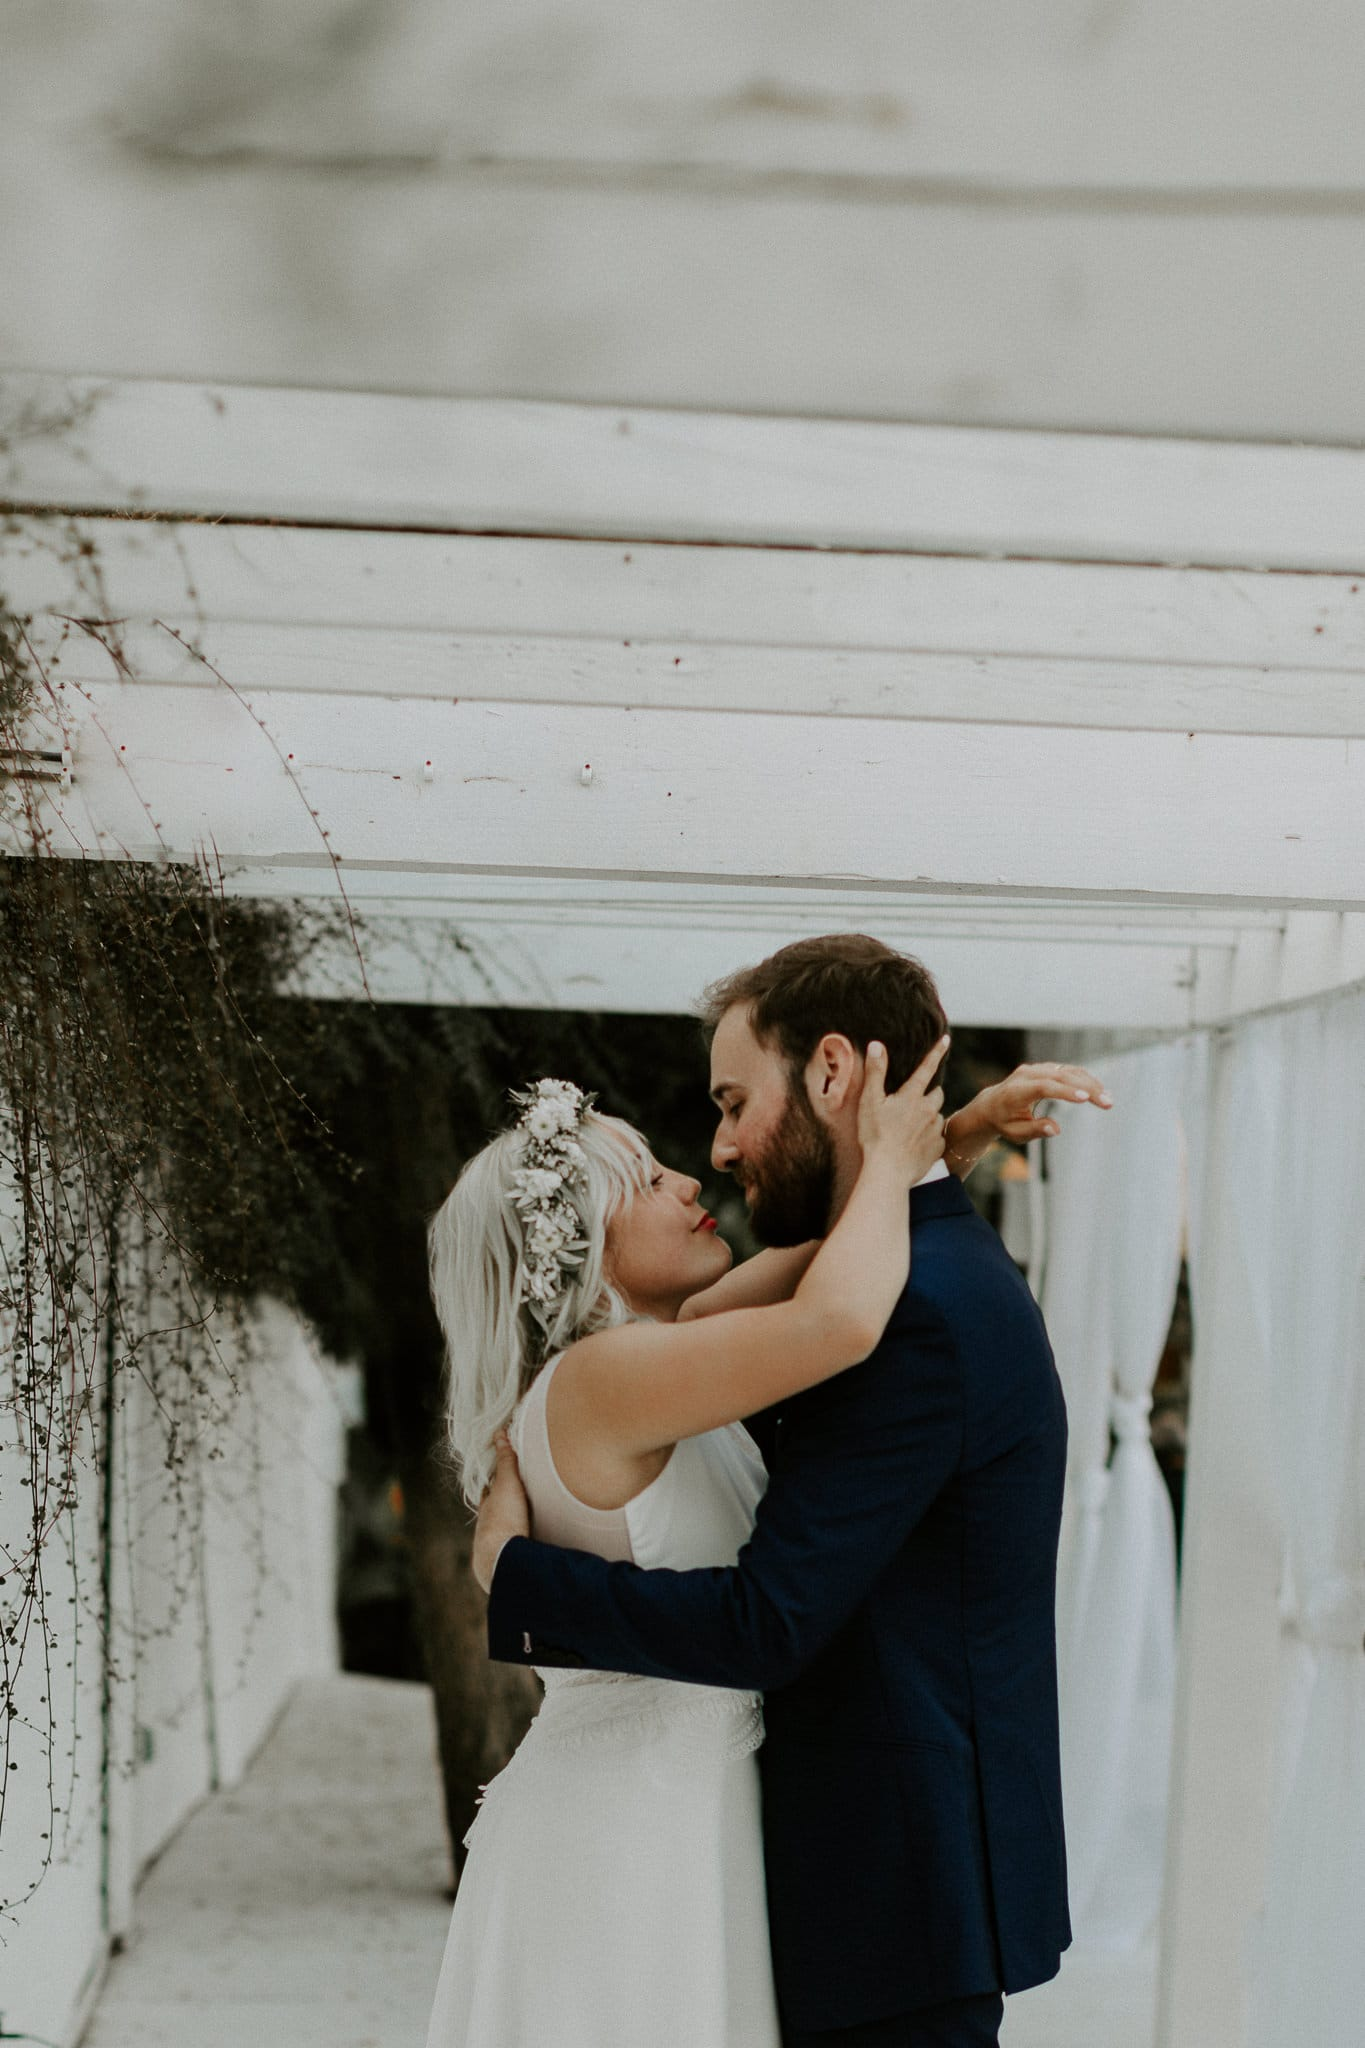 mariage-provence-corse-french-rivieira-photographe-dorotheebuteau